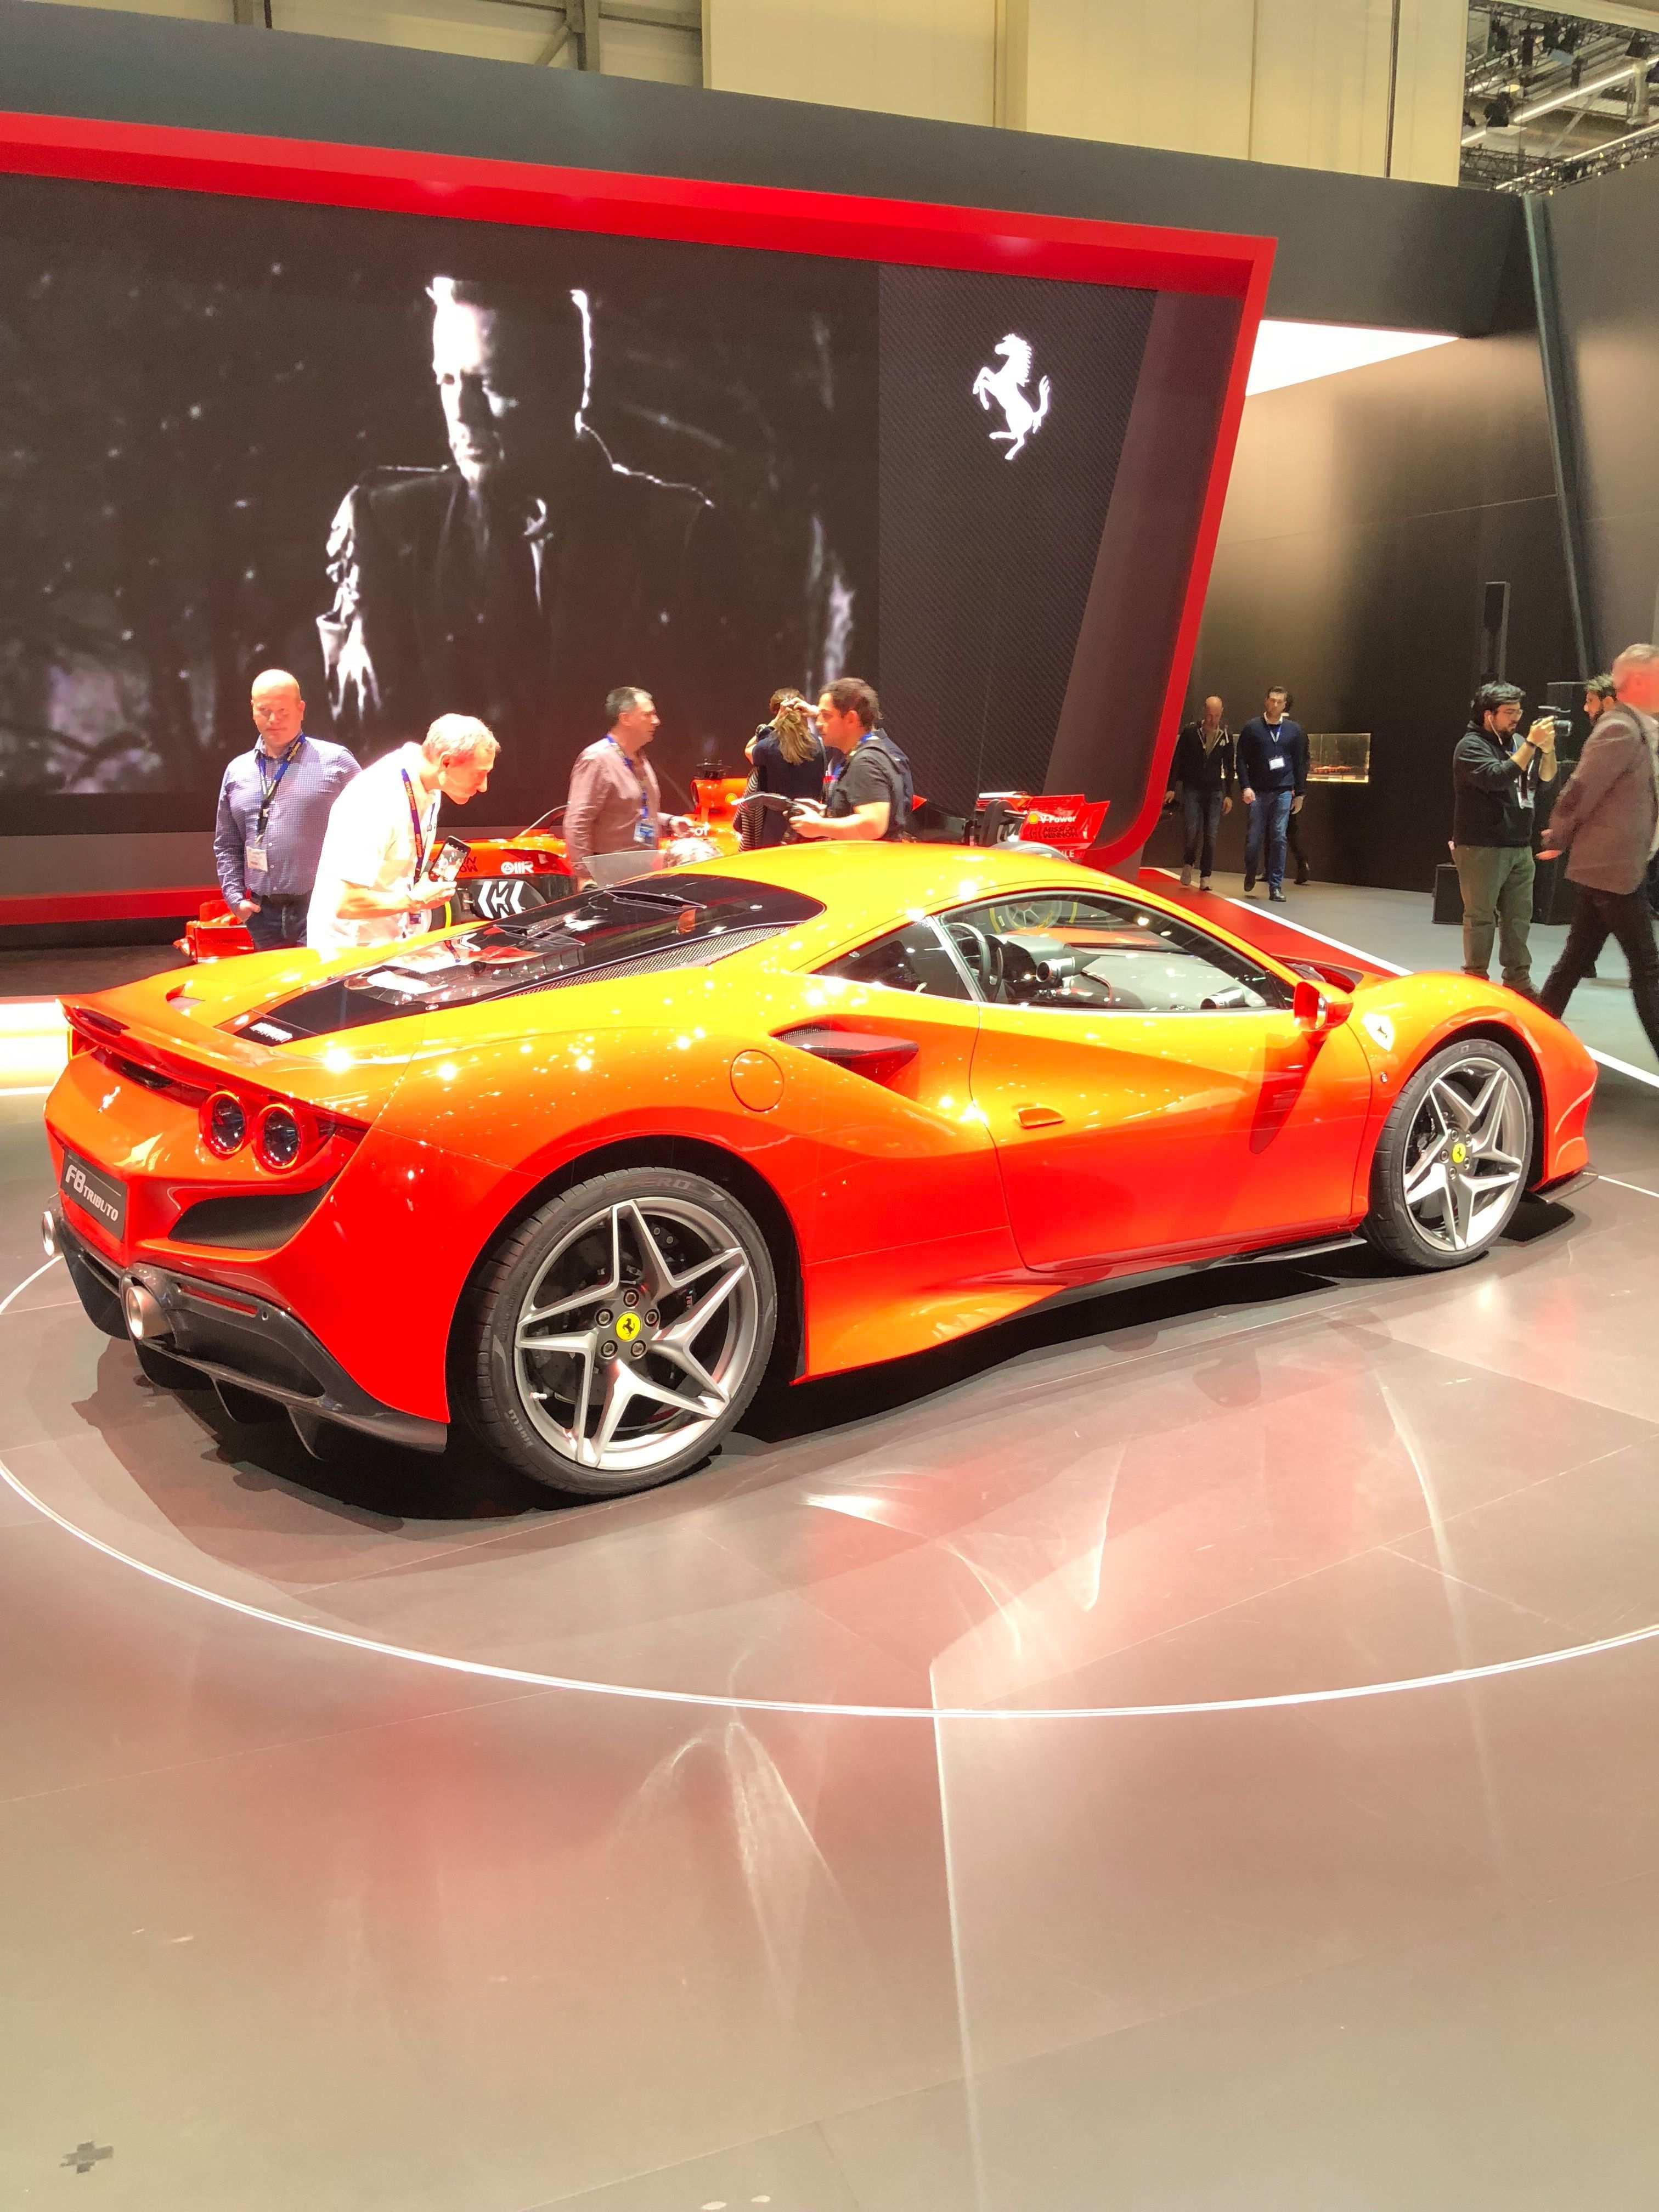 27 Great Ferrari B 2020 Pictures with Ferrari B 2020